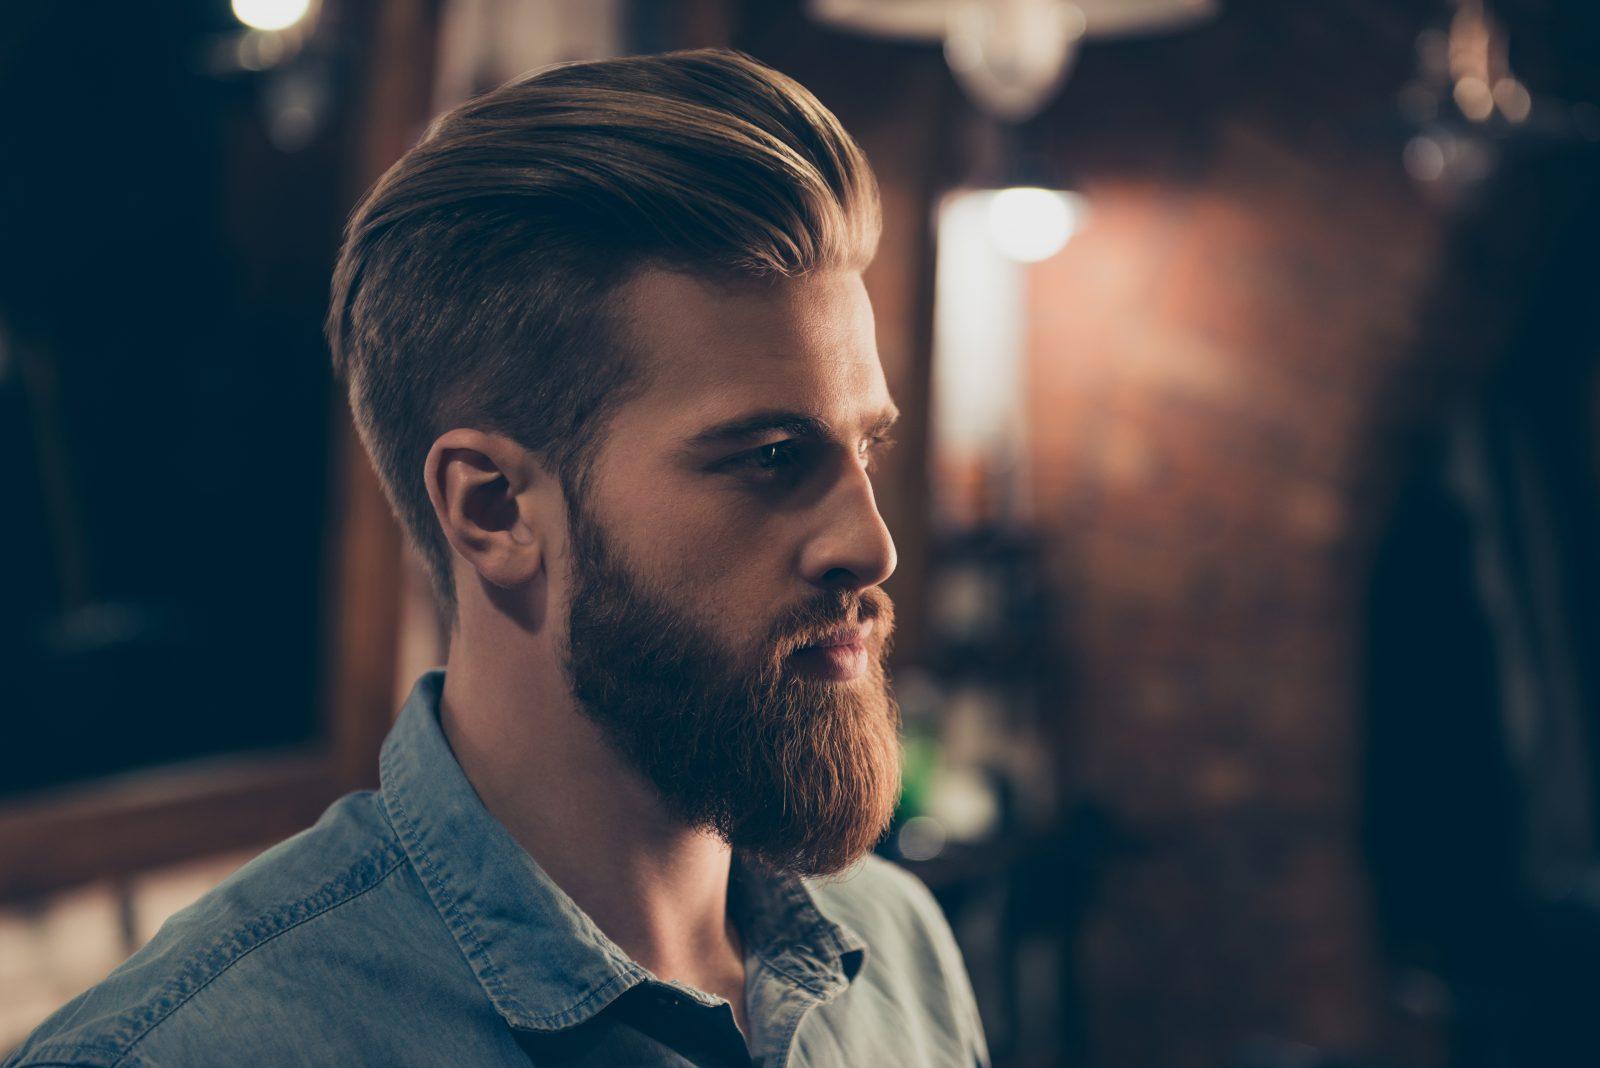 man with groomed beard